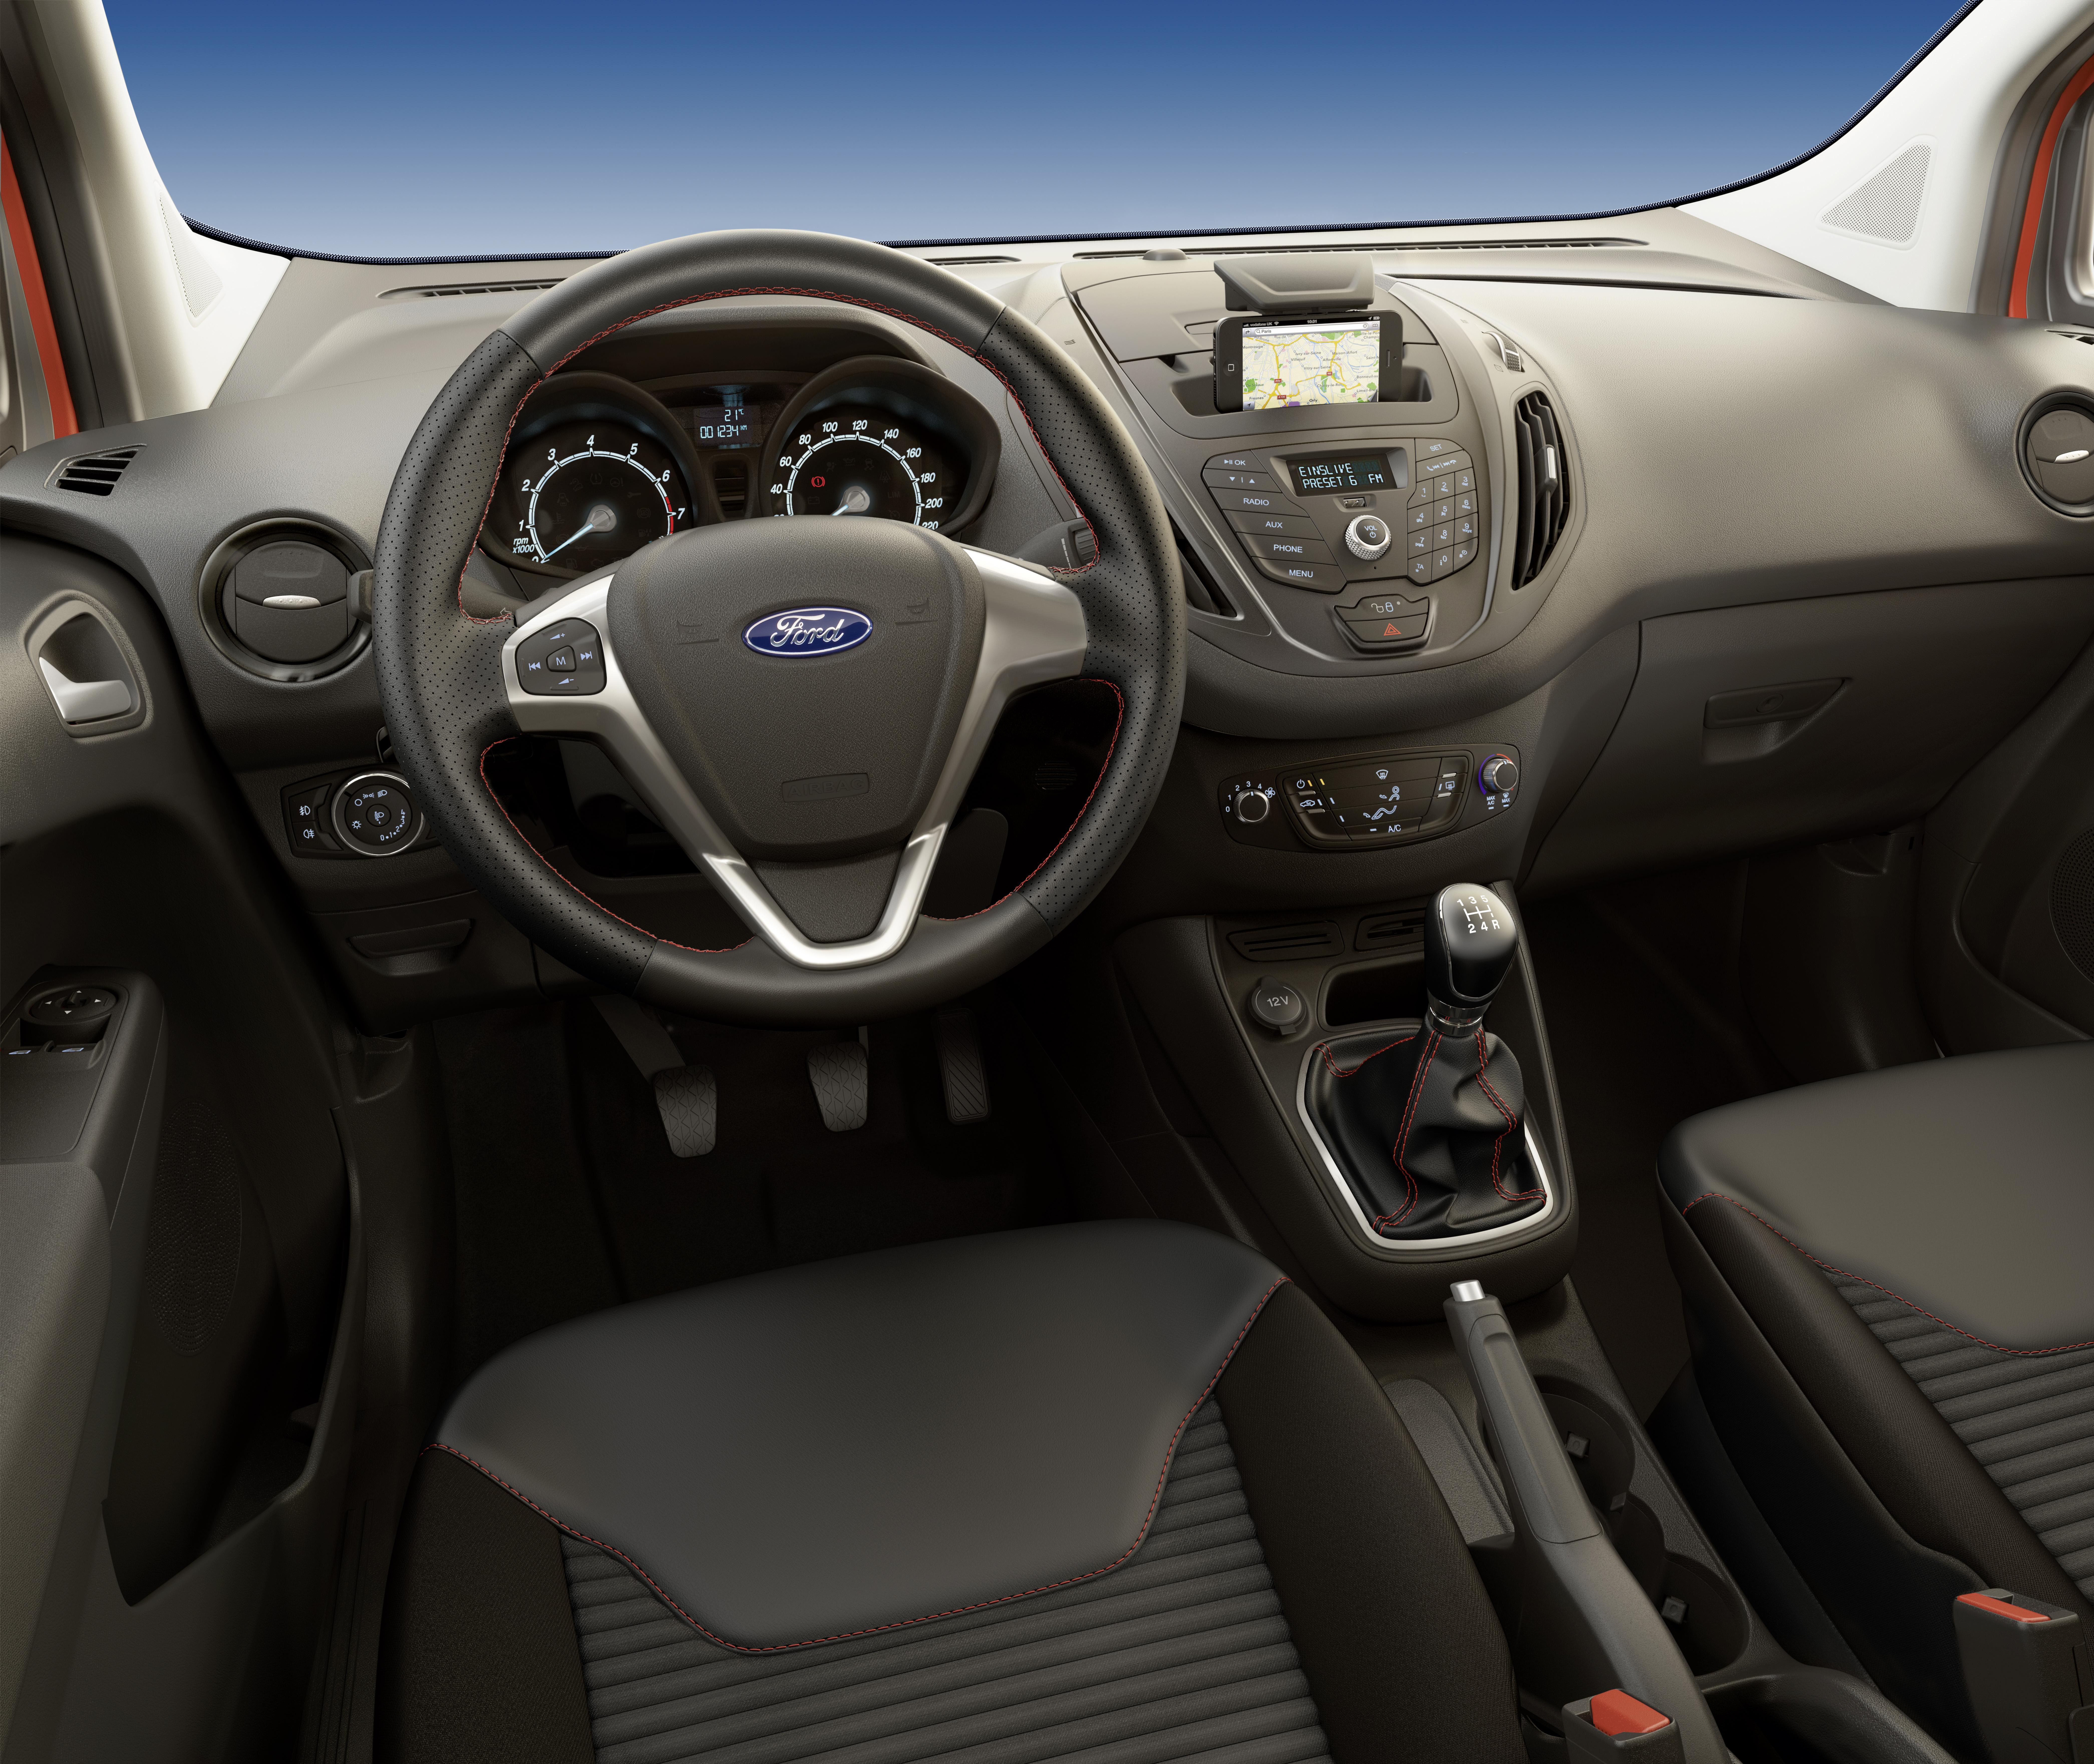 Ford Transit Courier Und Tourneo Jetzt Auch Als QuotSportquot Modelle